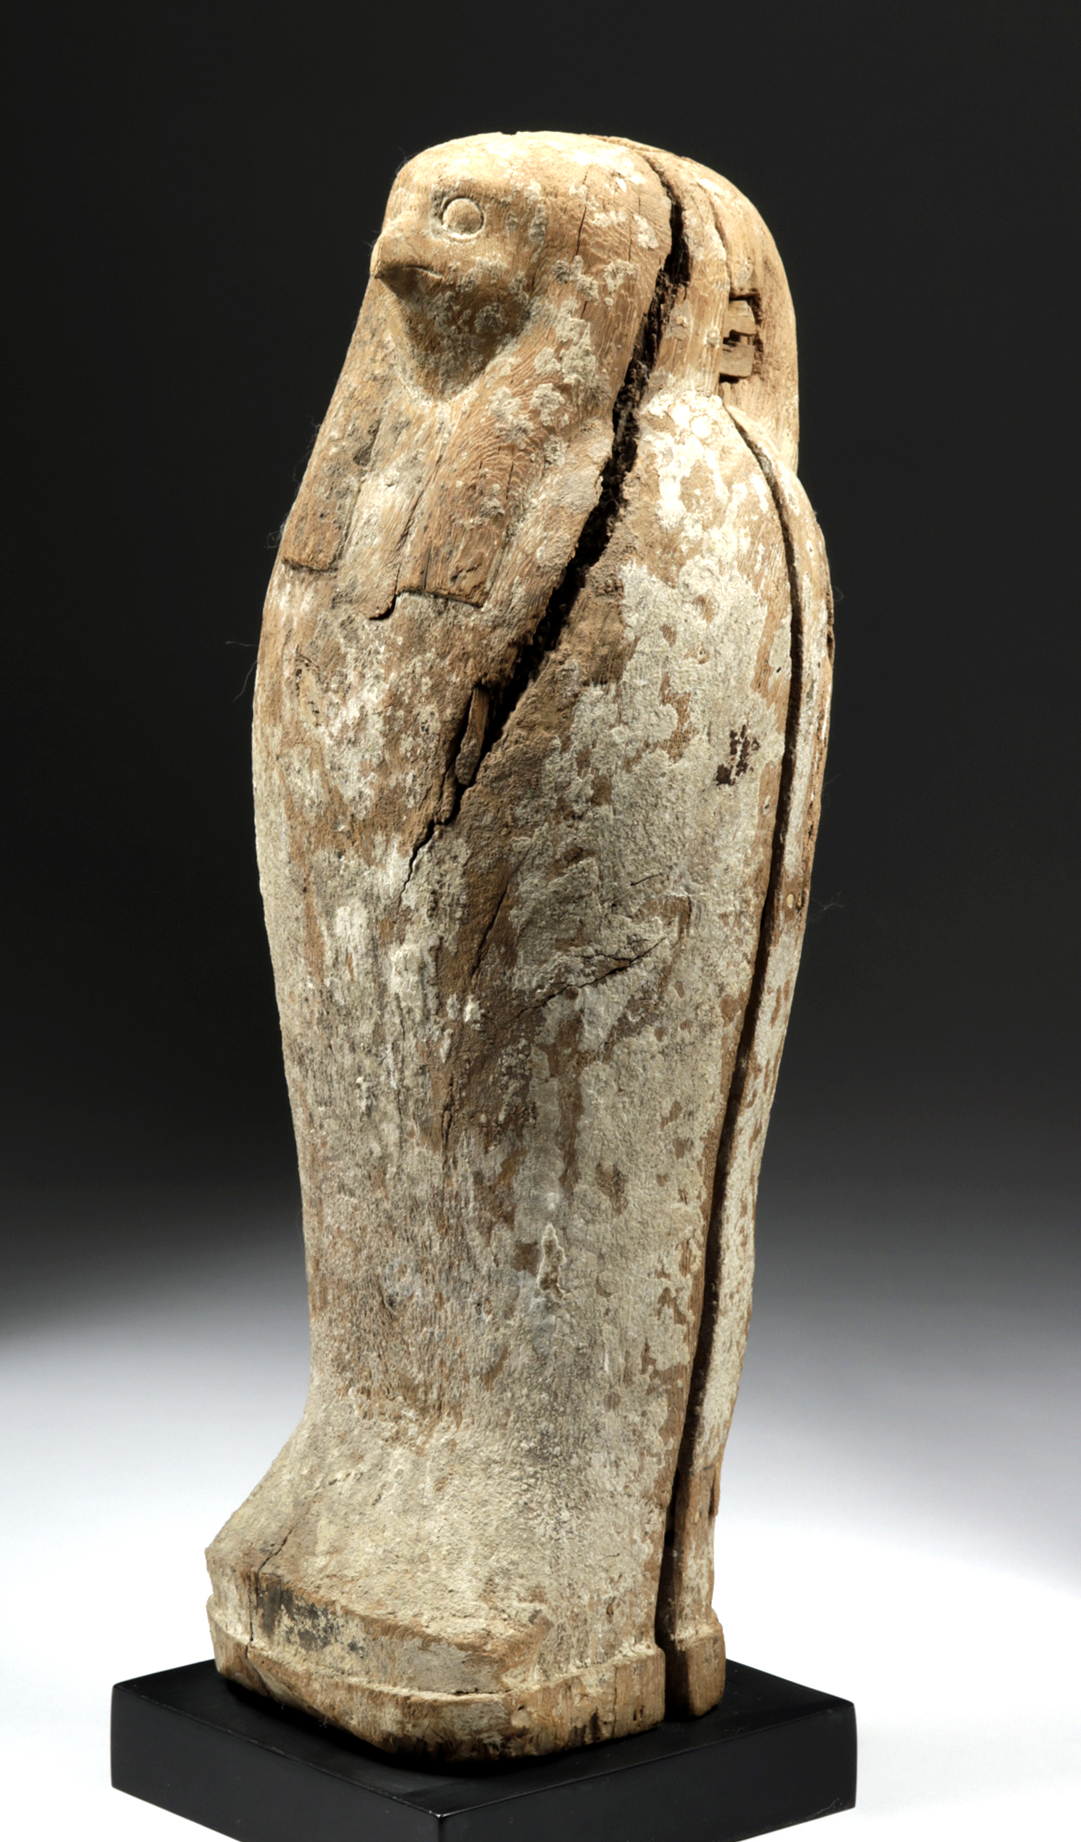 Lot 16 - Rare Egyptian Wood Sarcophagus of Falcon / Horus